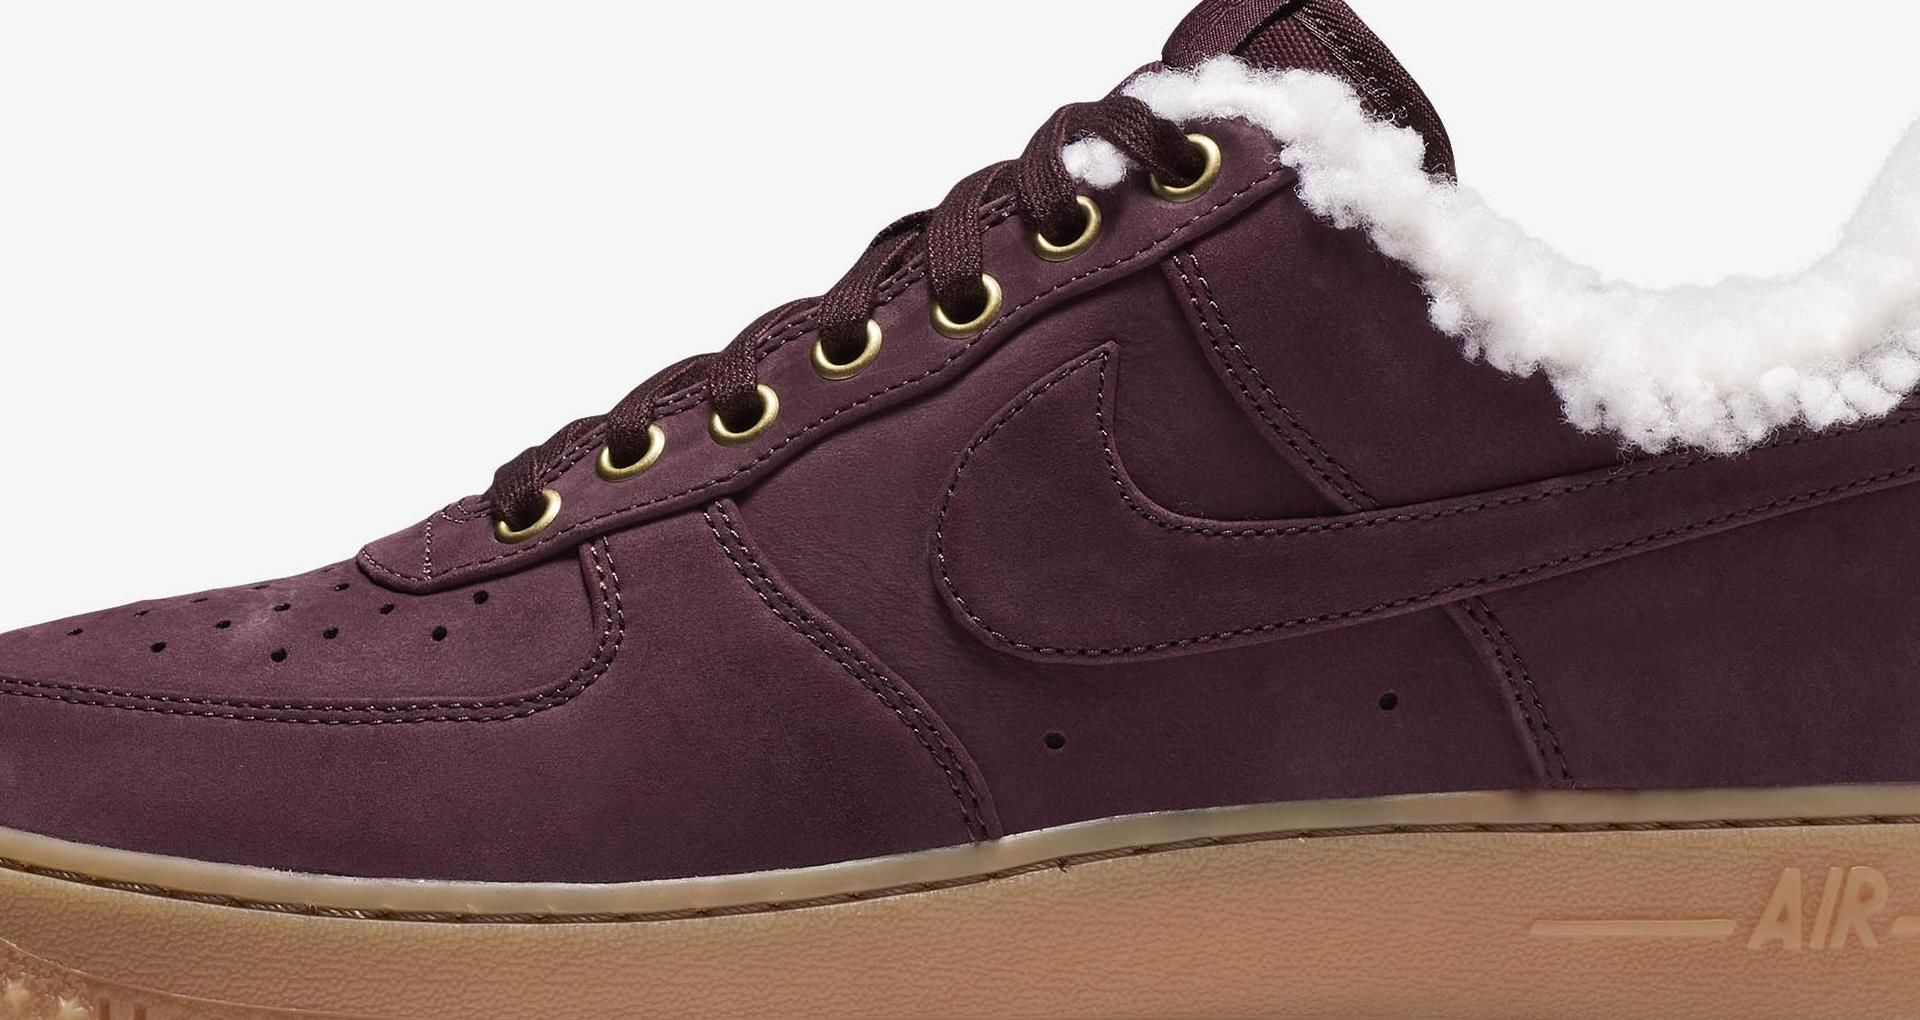 526bcd571cbed9 Nike Air Force 1 Premium Winter  Burgundy Crush   Gum Light Brown  ...